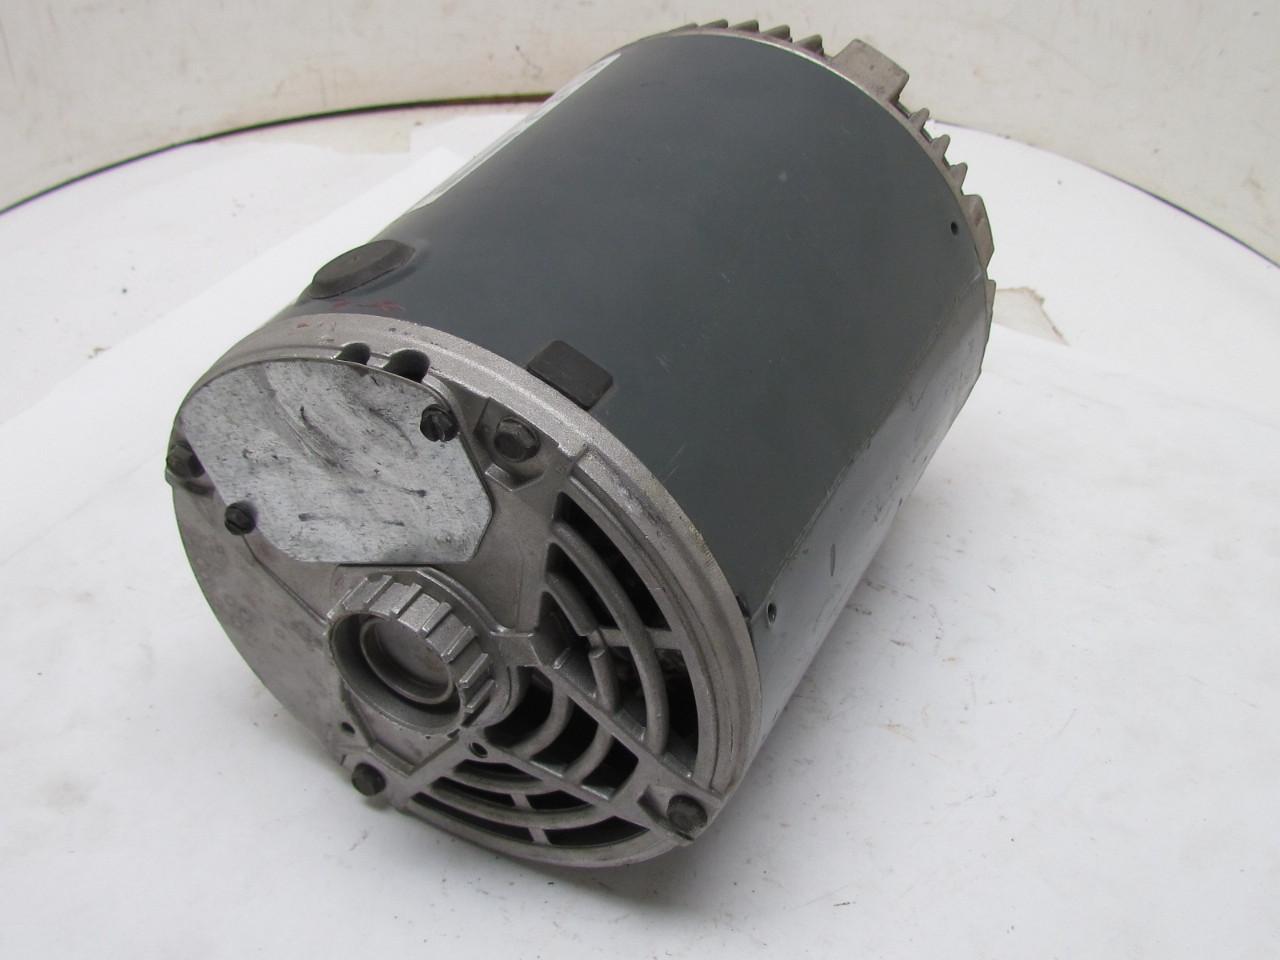 Marathon 5k46kn2173 k222 3 phase ac motor 1 5hp 3450 rpm for 56c frame motor dimensions